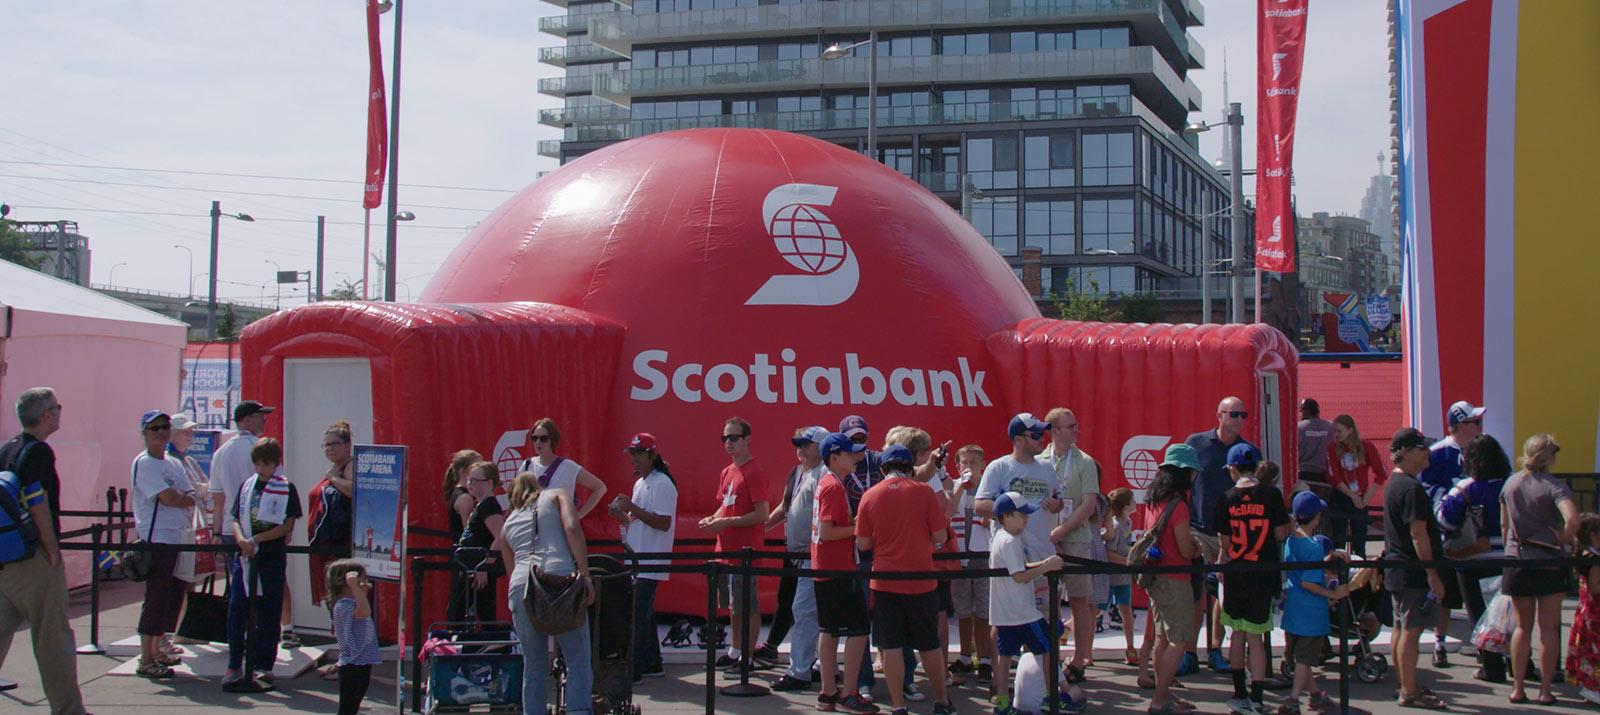 scotiabank-banner-1.jpg